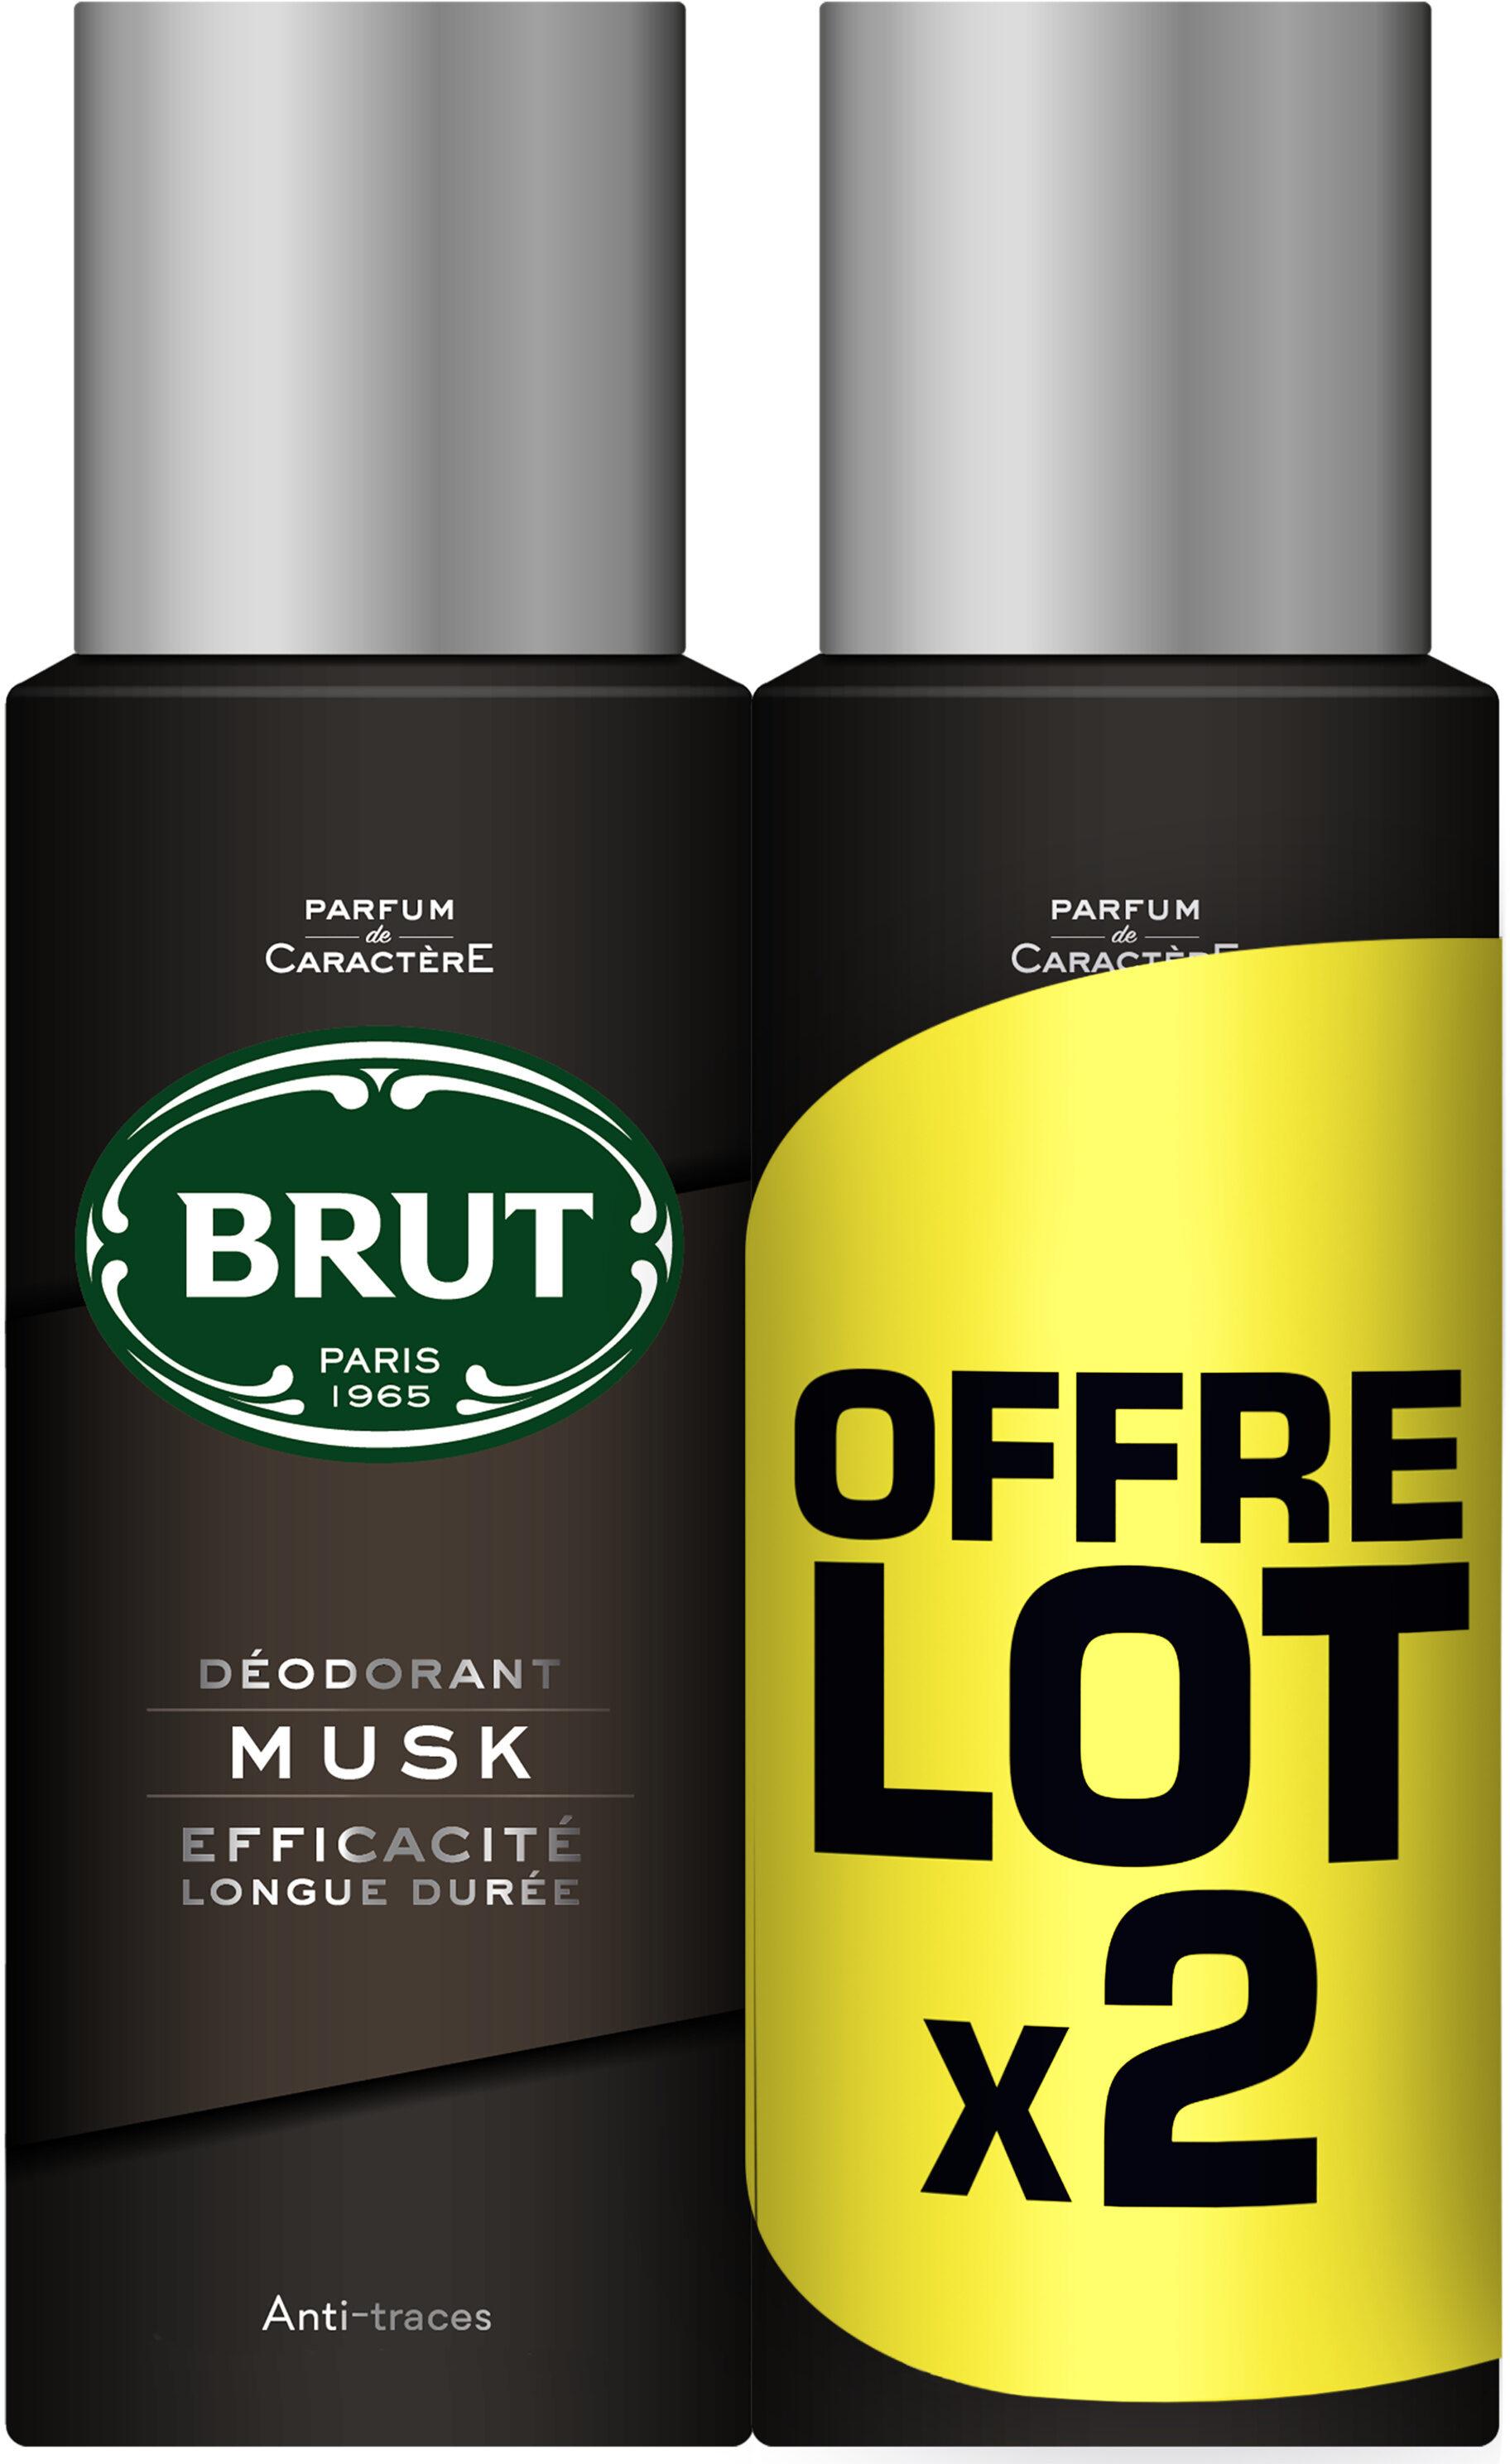 Brut Déodorant Homme Spray Musk 200ml Lot de 2 - Product - fr